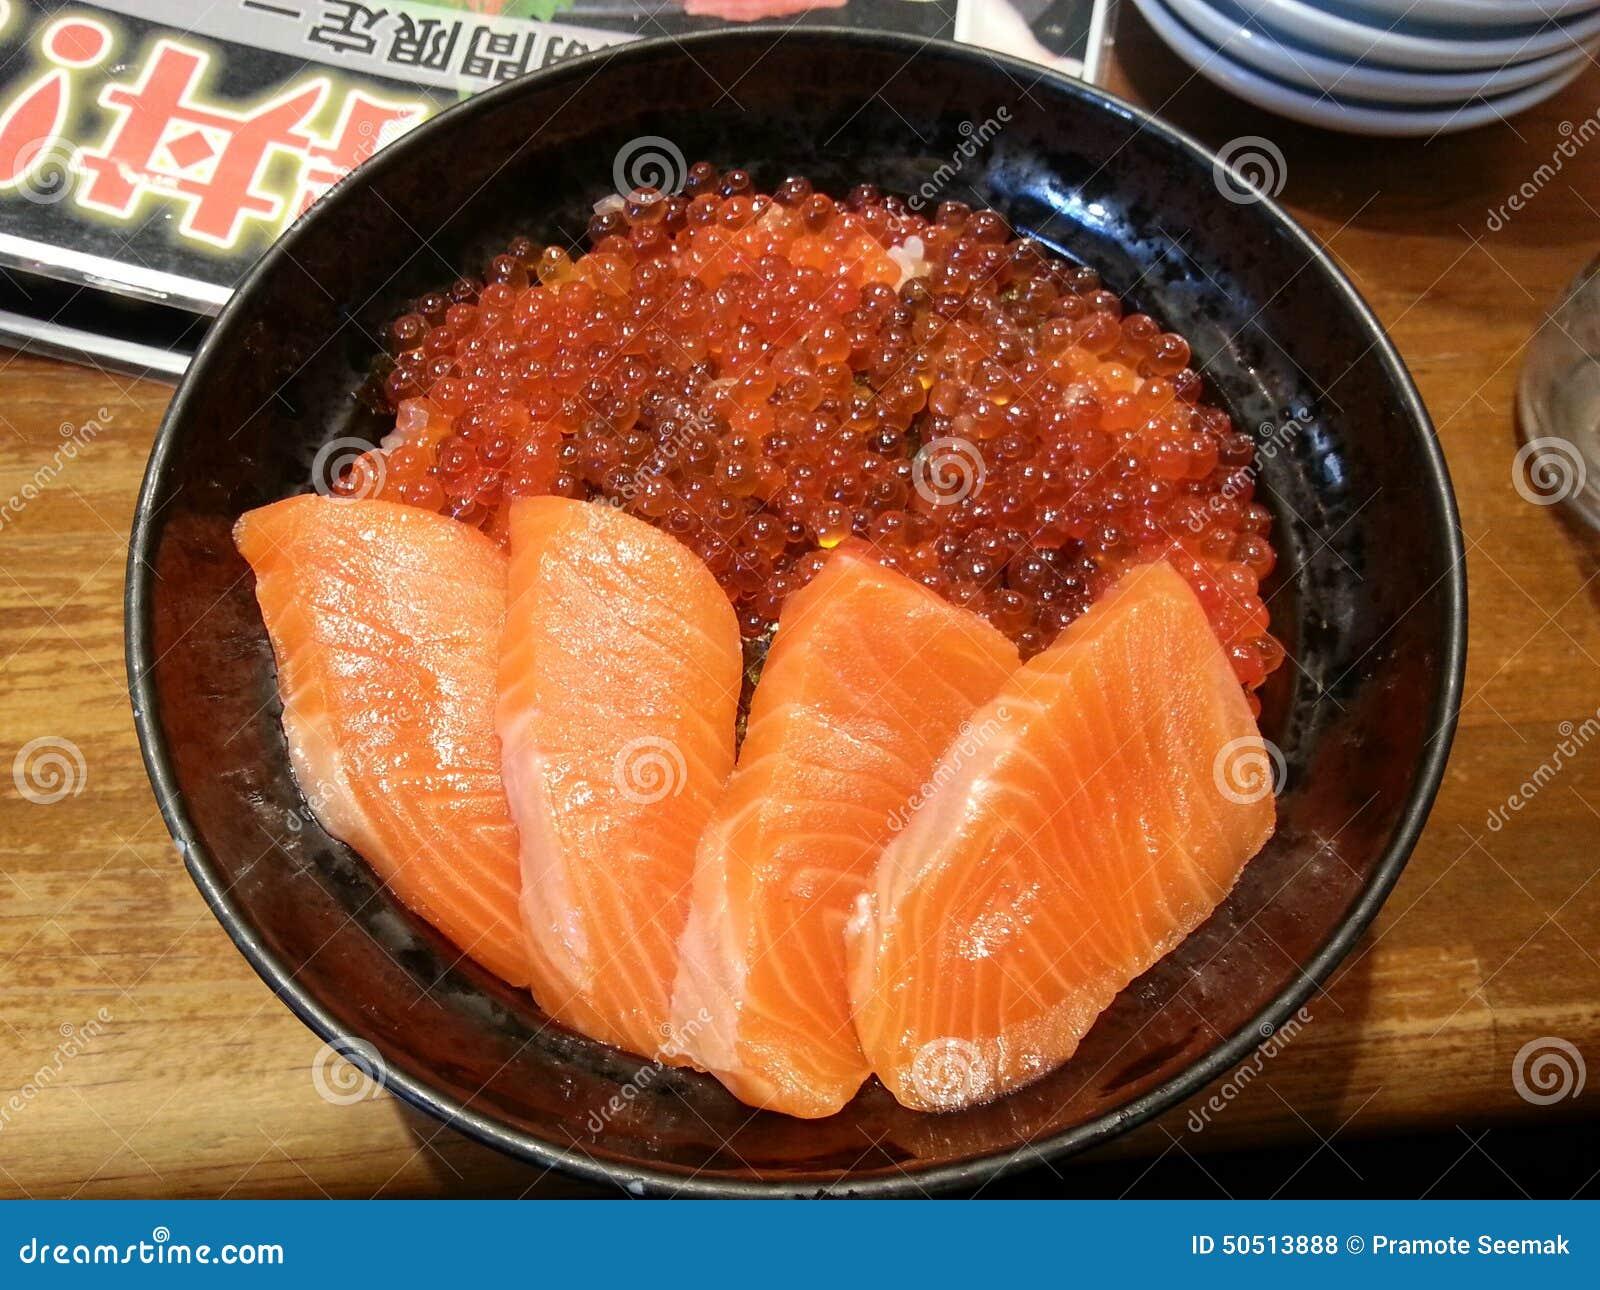 Salmon ikura don japanese food japan stock photo image for Fish eggs food